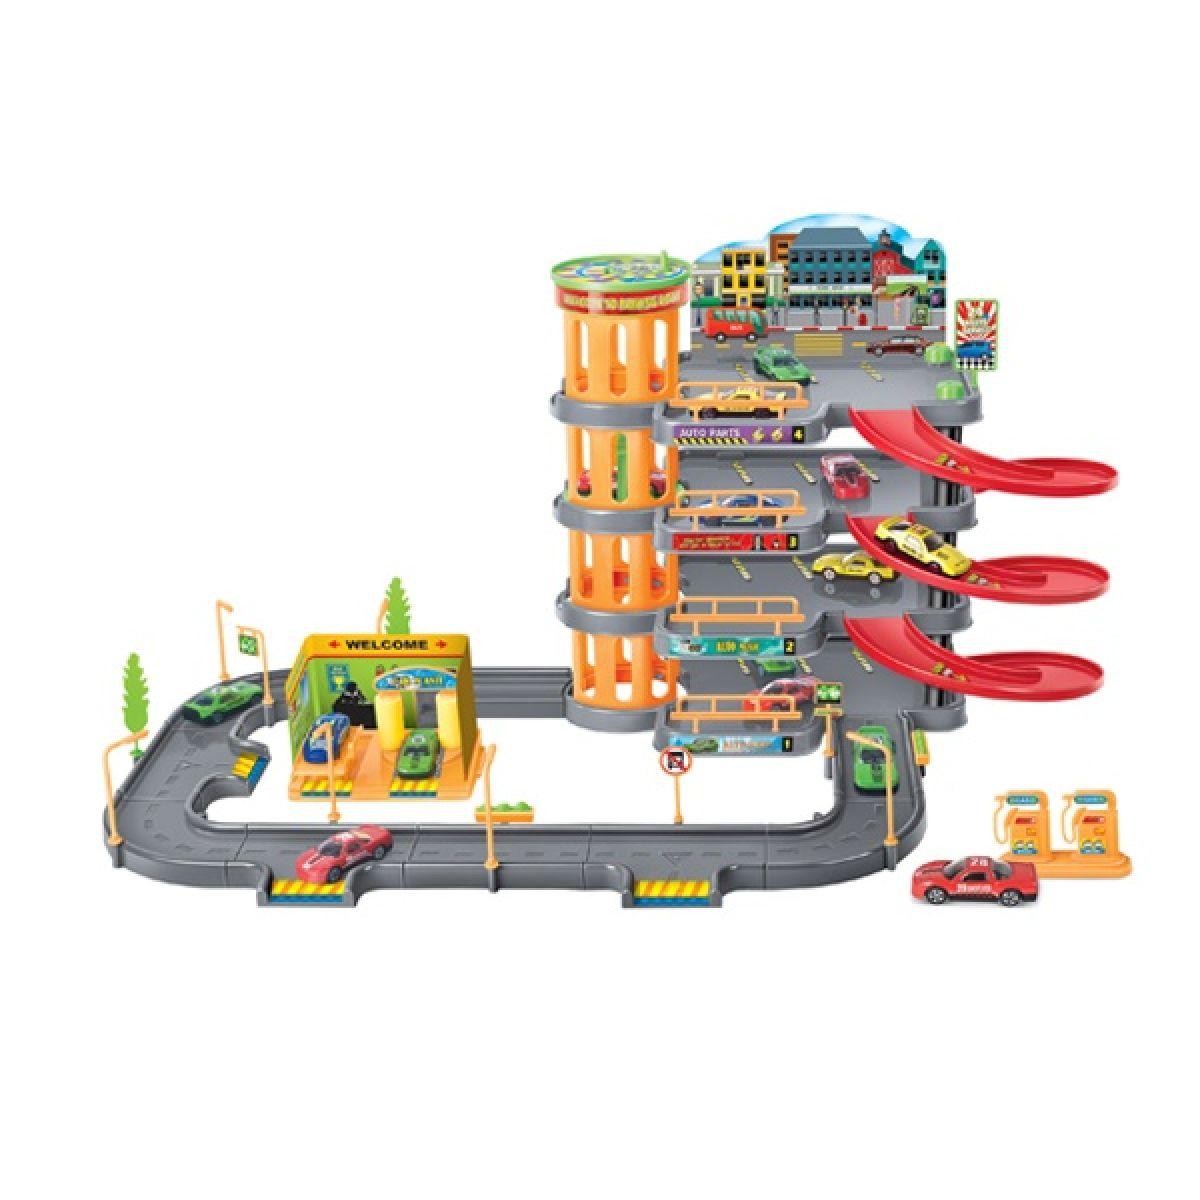 KidsHome Garáž 3 patra s dráhou a 4 auta